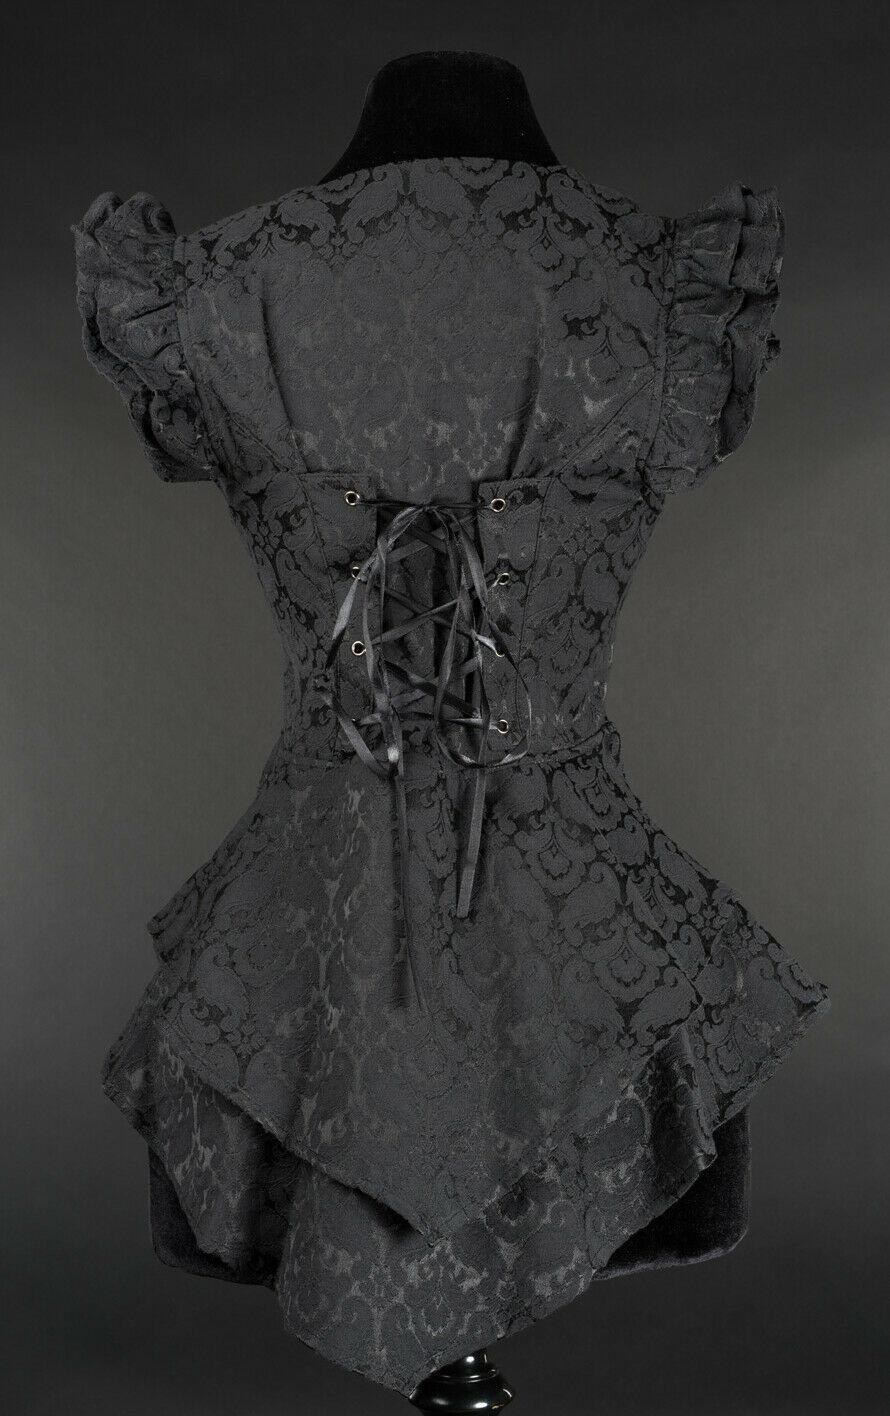 Black Brocade Victorian Gothic Corset Back Vest Steampunk Frilly Waistcoat